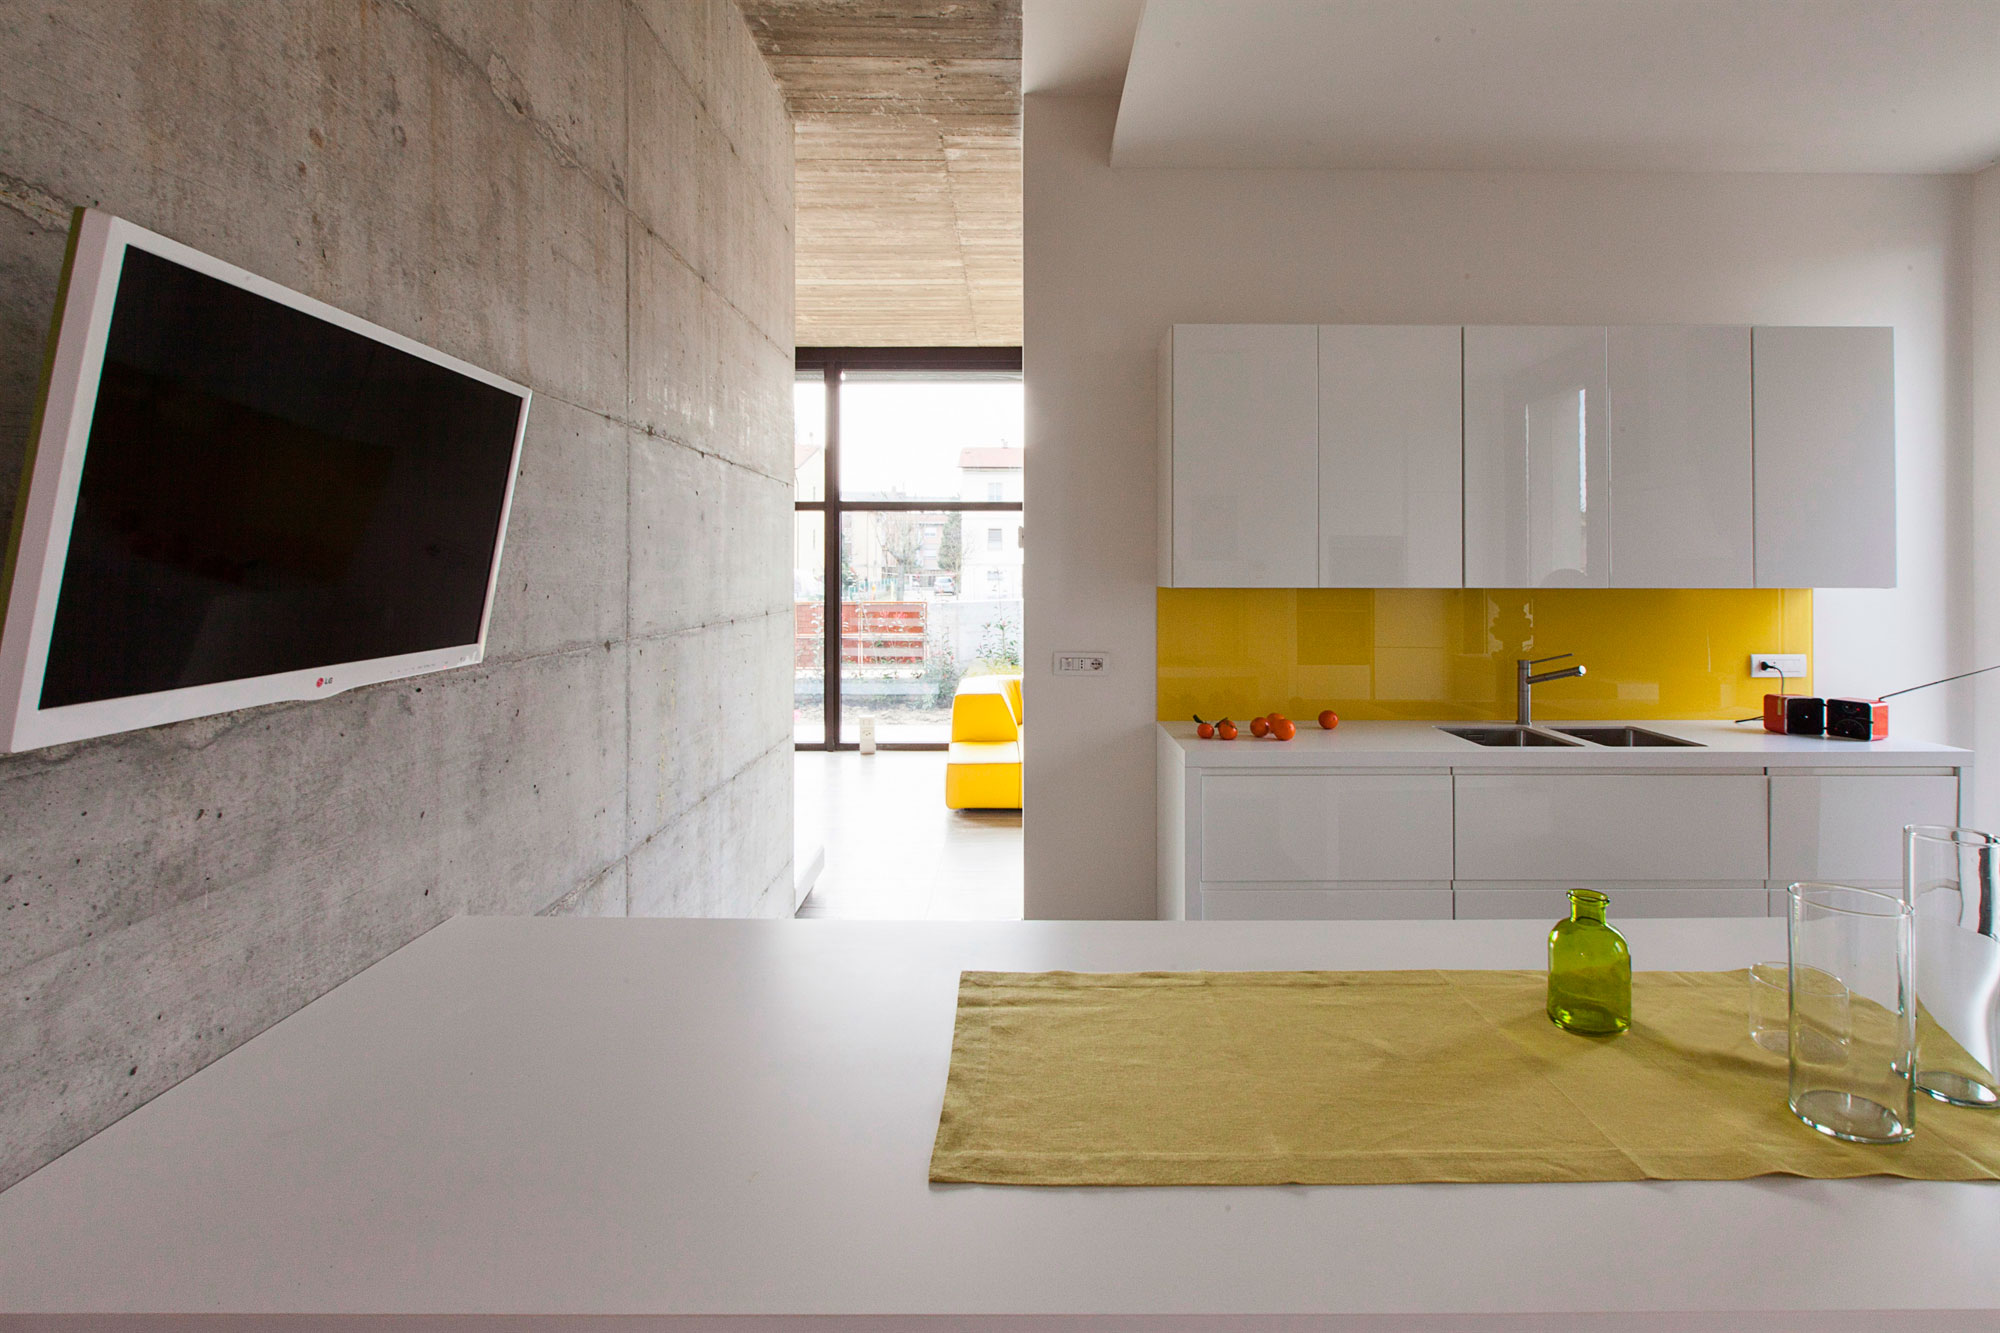 D'Autore Residence near Bologna by Giraldi Associati Architetti-22